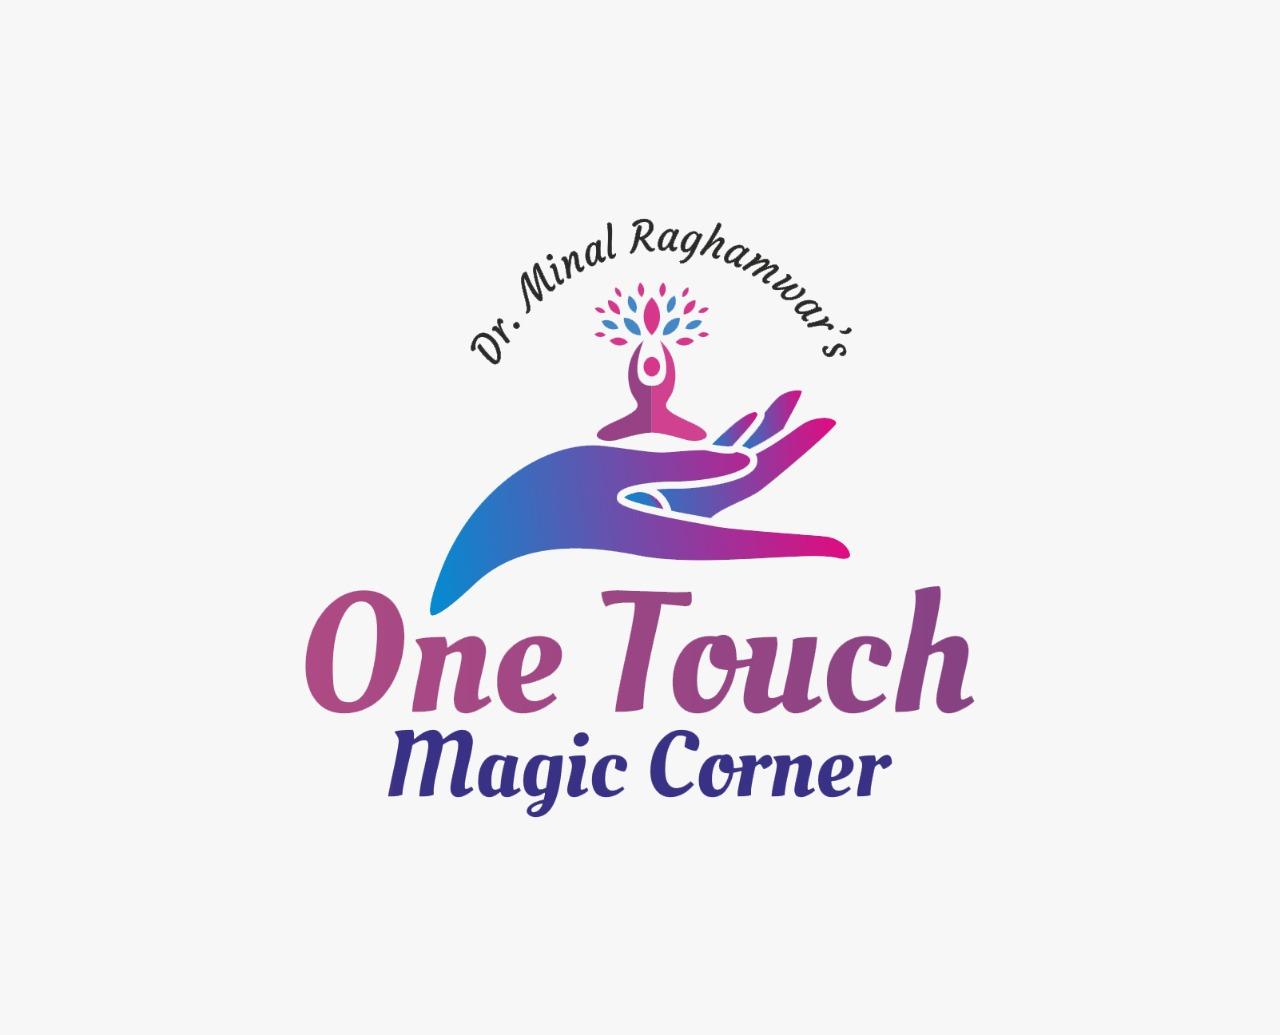 One Touch Magic Corner